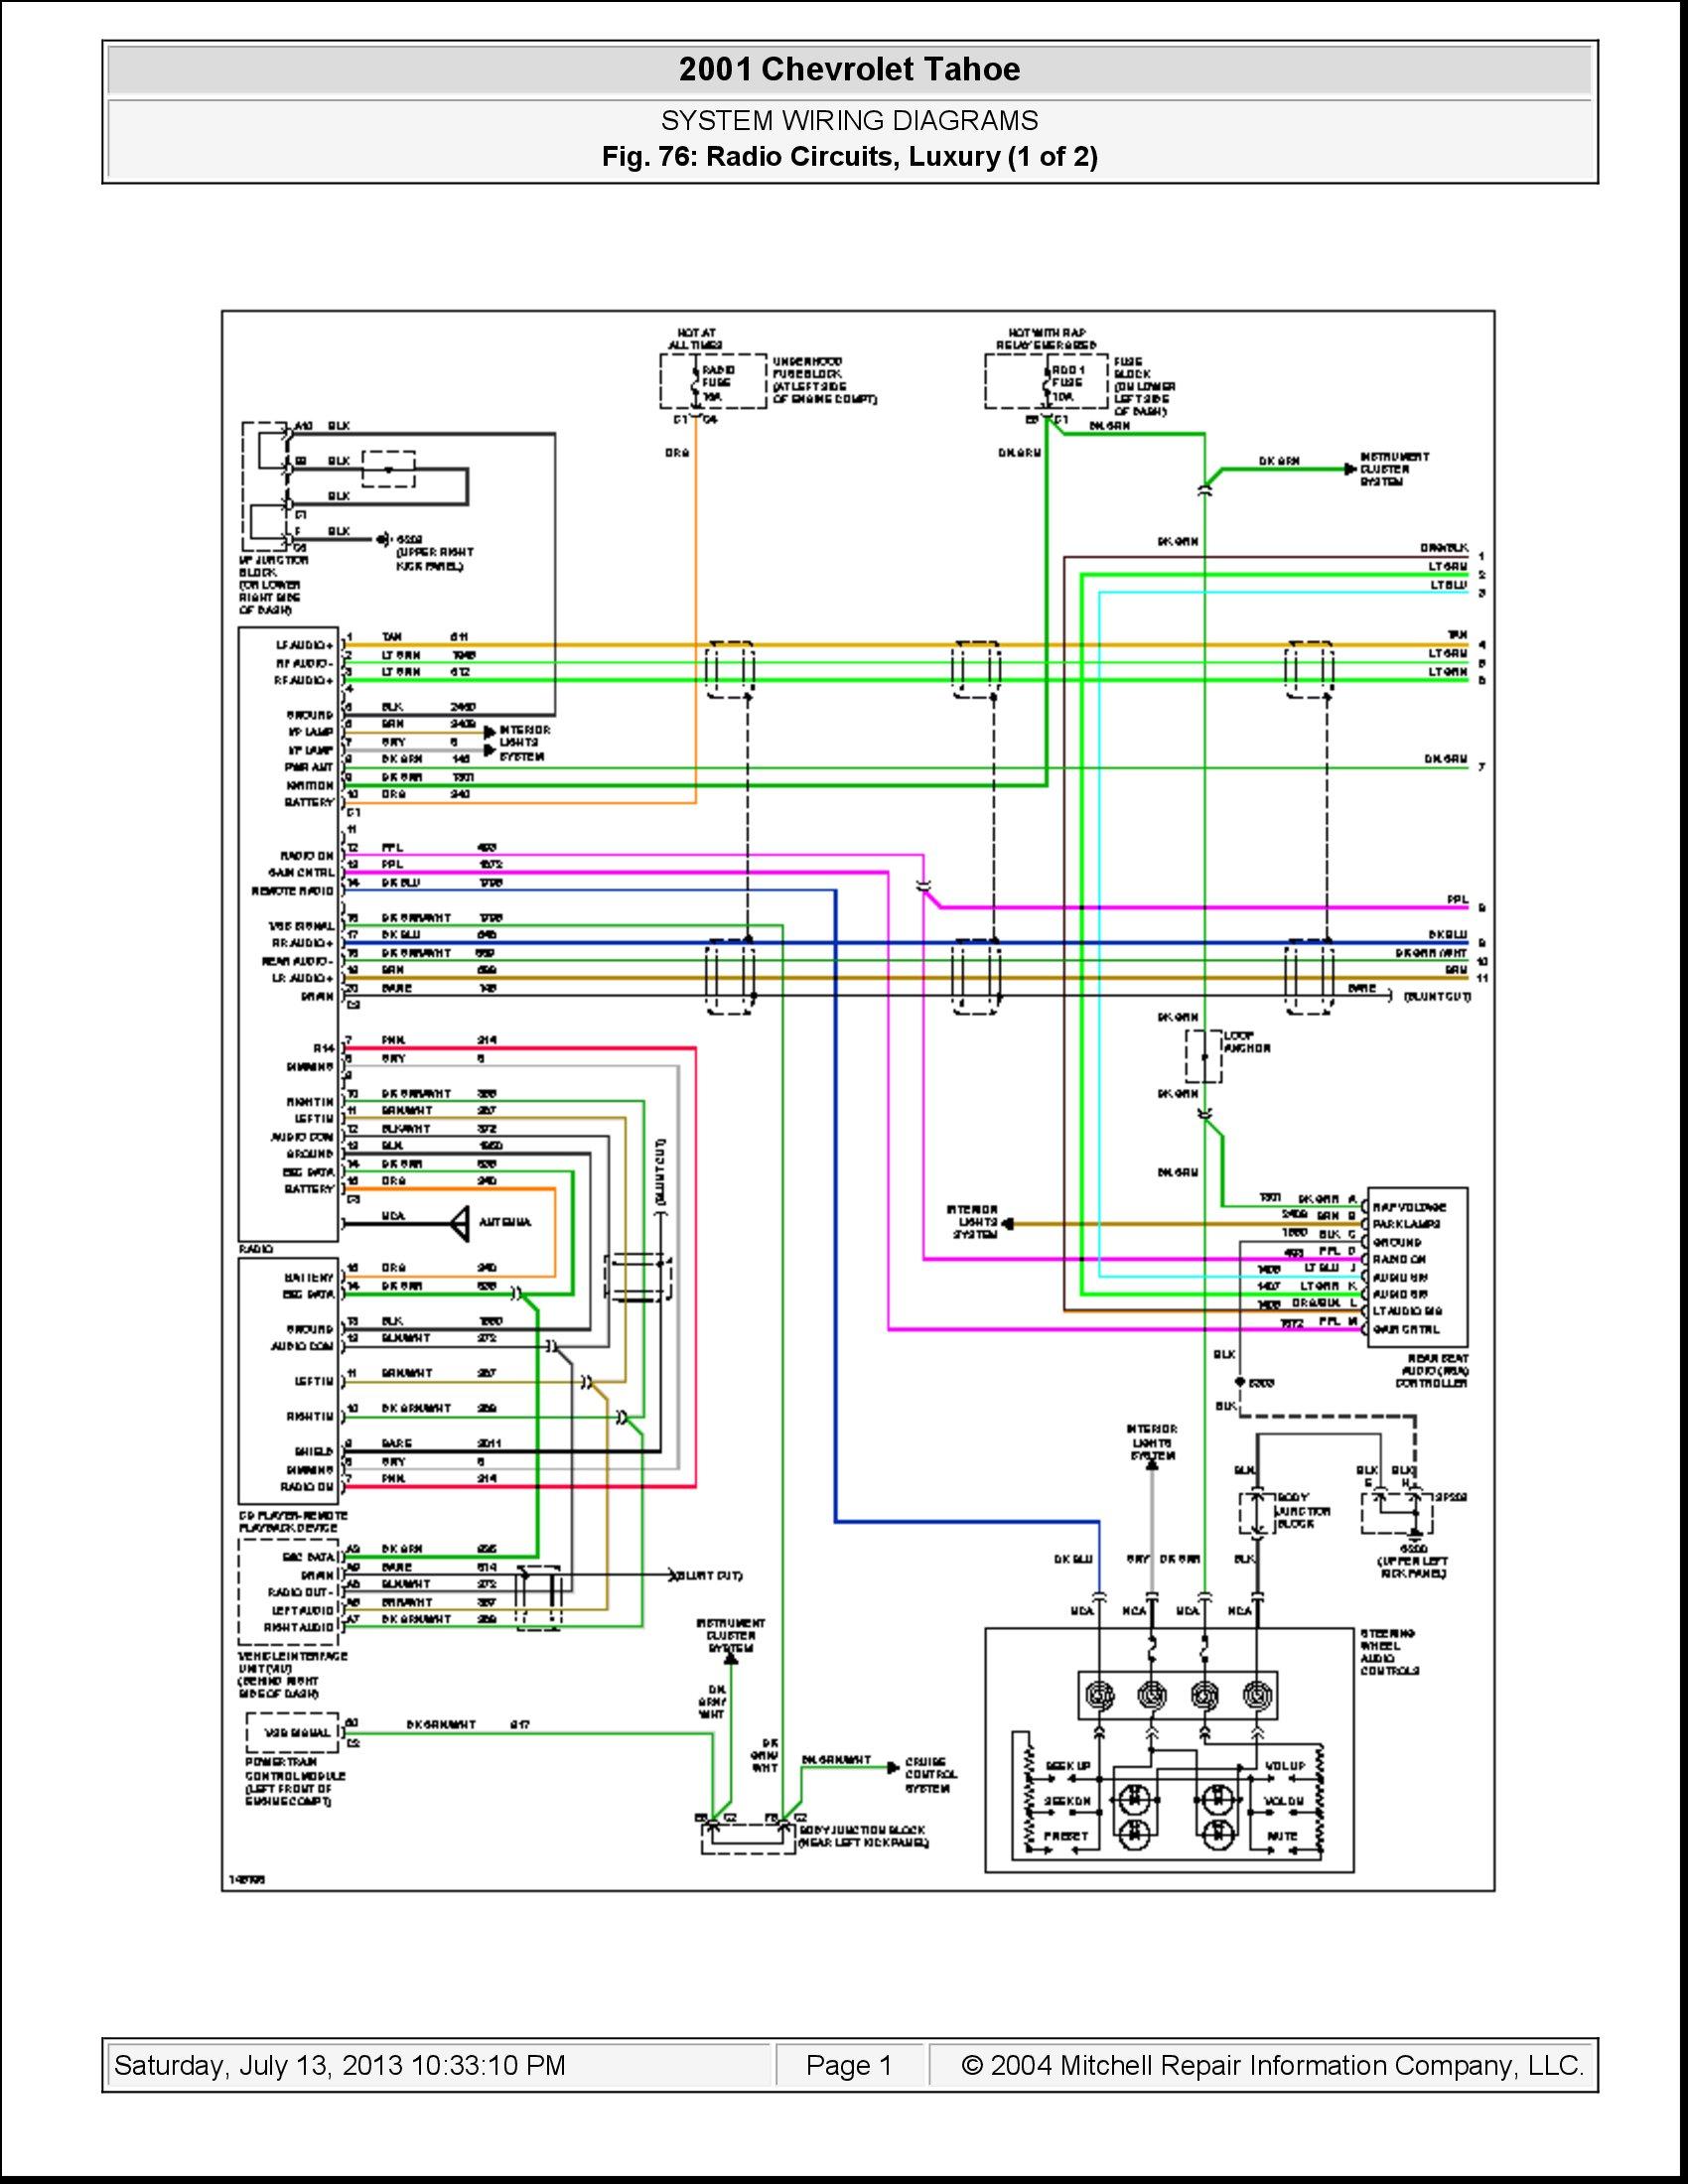 Chevy Tahoe Stereo Wiring -96 Ford Ranger Spark Plug Wiring Diagram |  Begeboy Wiring Diagram SourceBegeboy Wiring Diagram Source